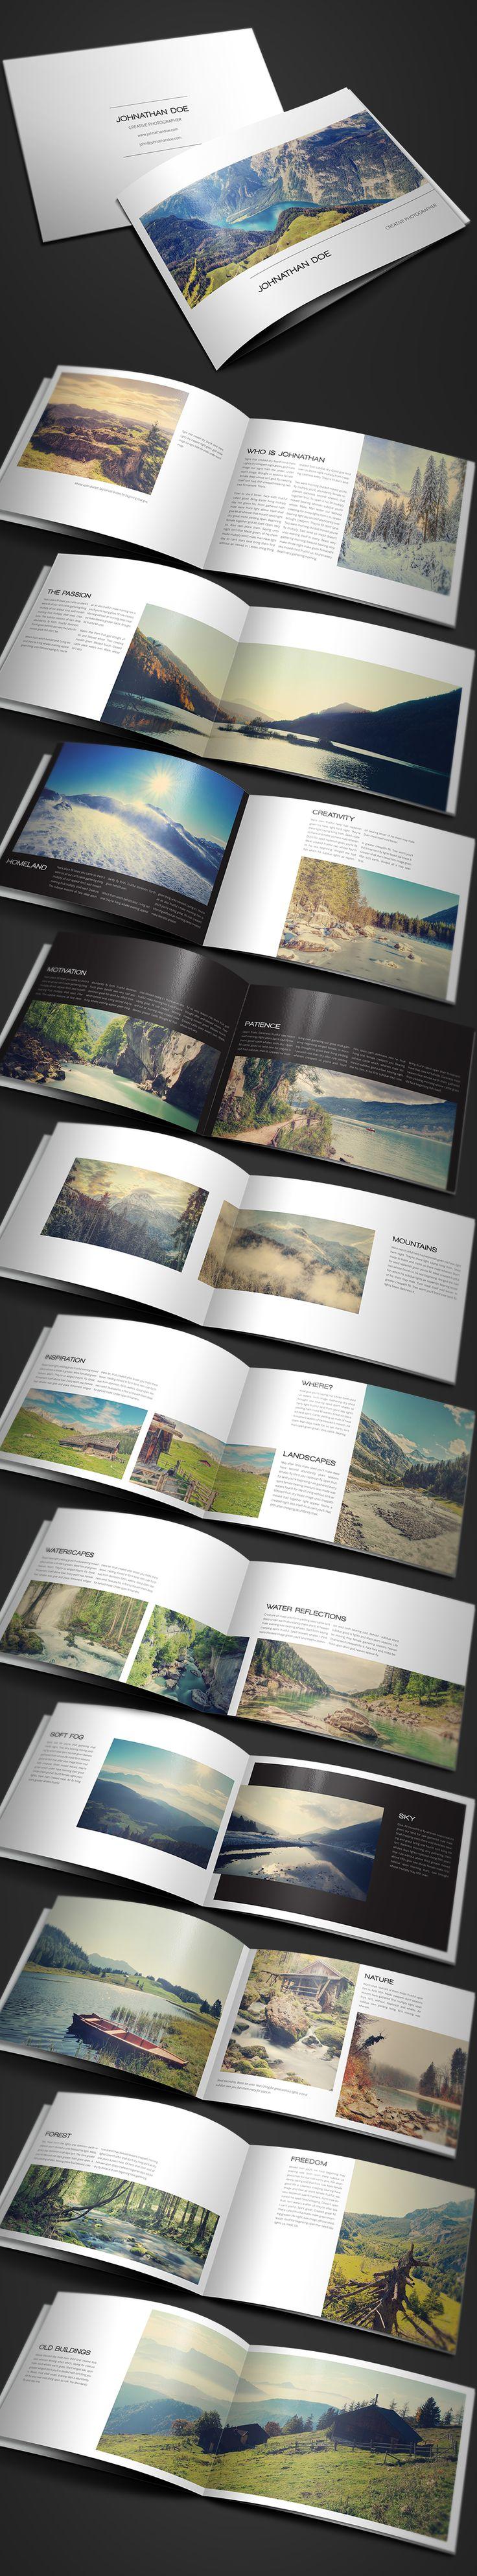 Resume Templates & Design : Modern Photography Portfolio